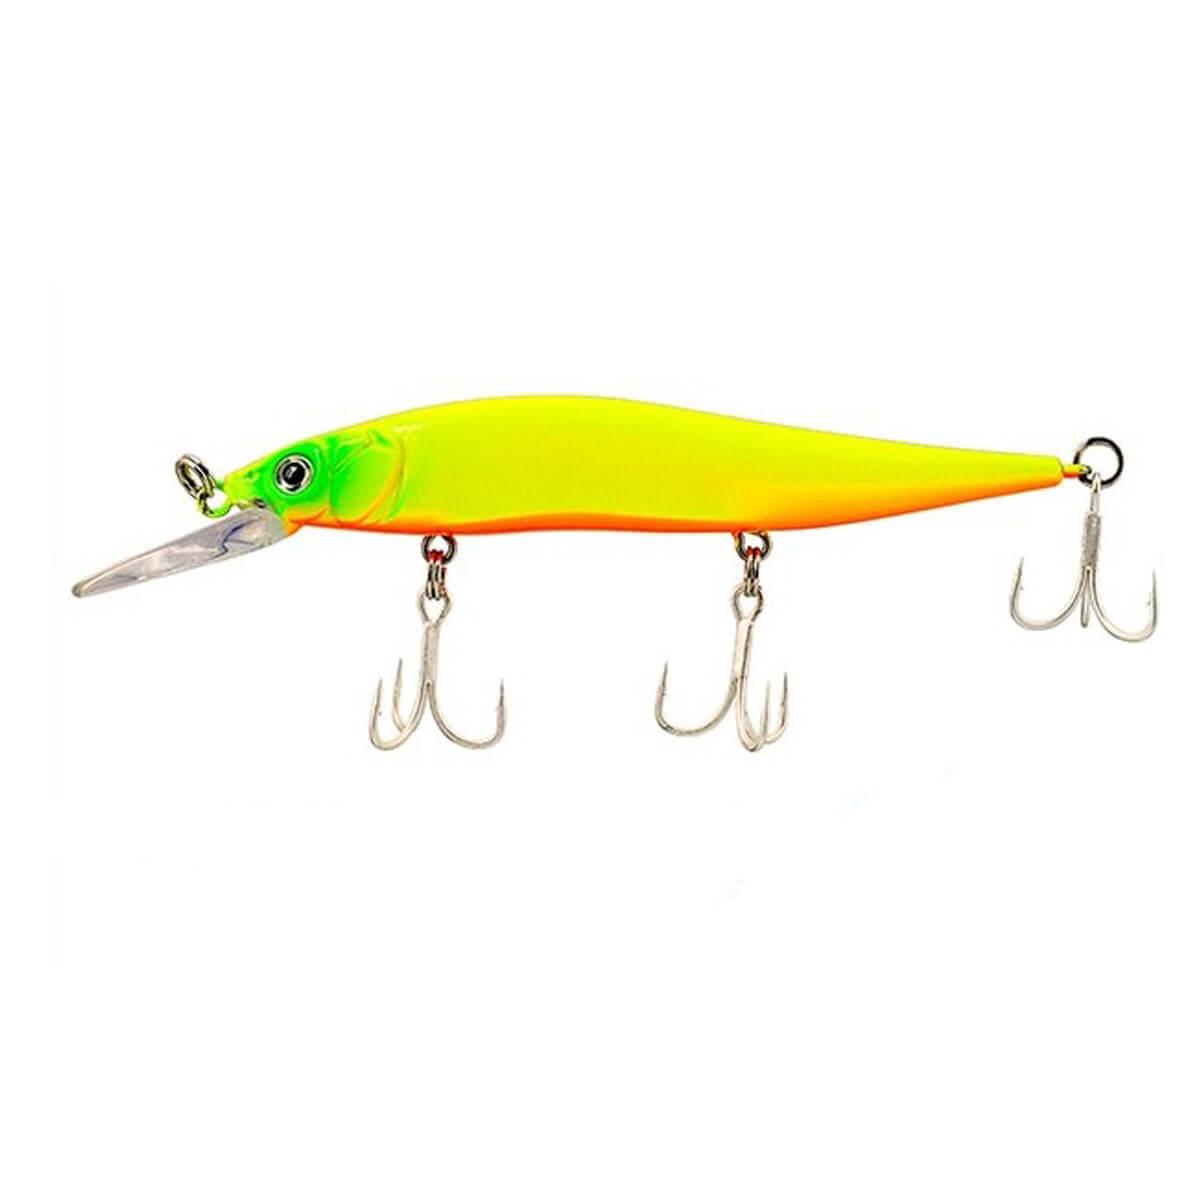 Isca Artificial Nitro Fishing Fênix 98  - Pró Pesca Shop